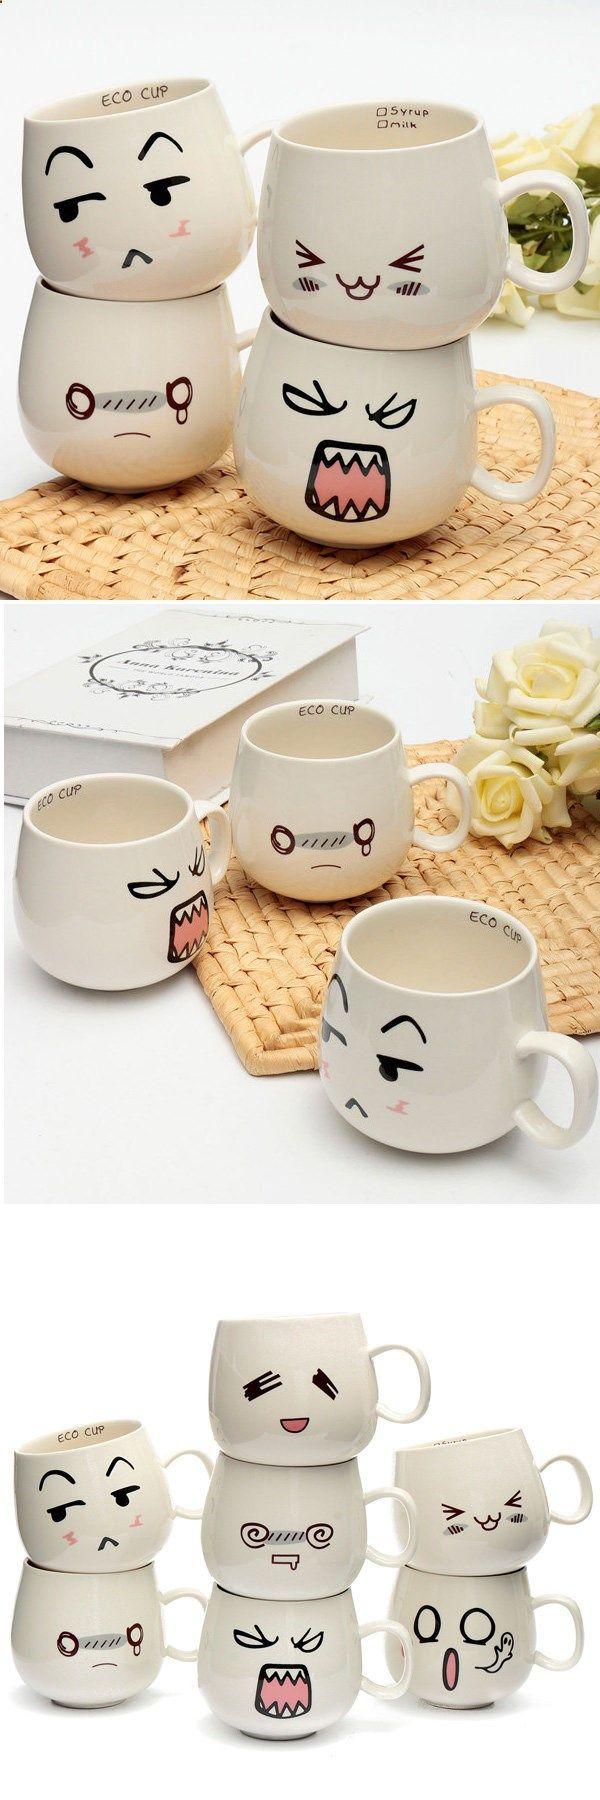 Smiley Face Coffee Mug Best 25 Face Mug Ideas On Pinterest Clay Sculptures Cute Cups